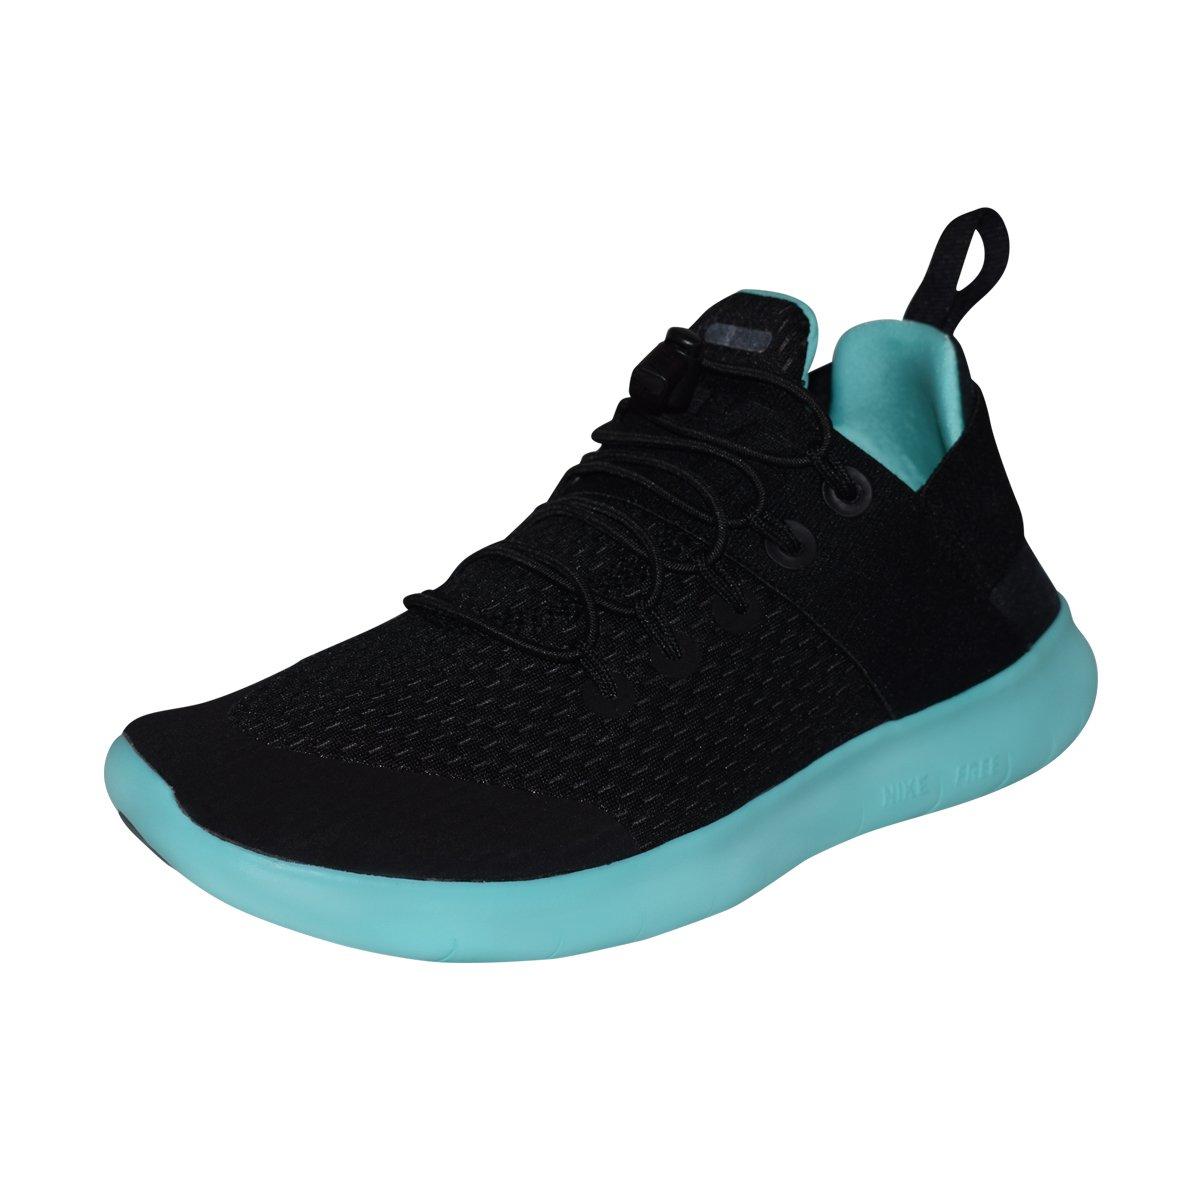 NIKE Women's Free RN CMTR 2017 Running Shoe B07BZKPZJ7 9 B(M) US|Black/Aurora